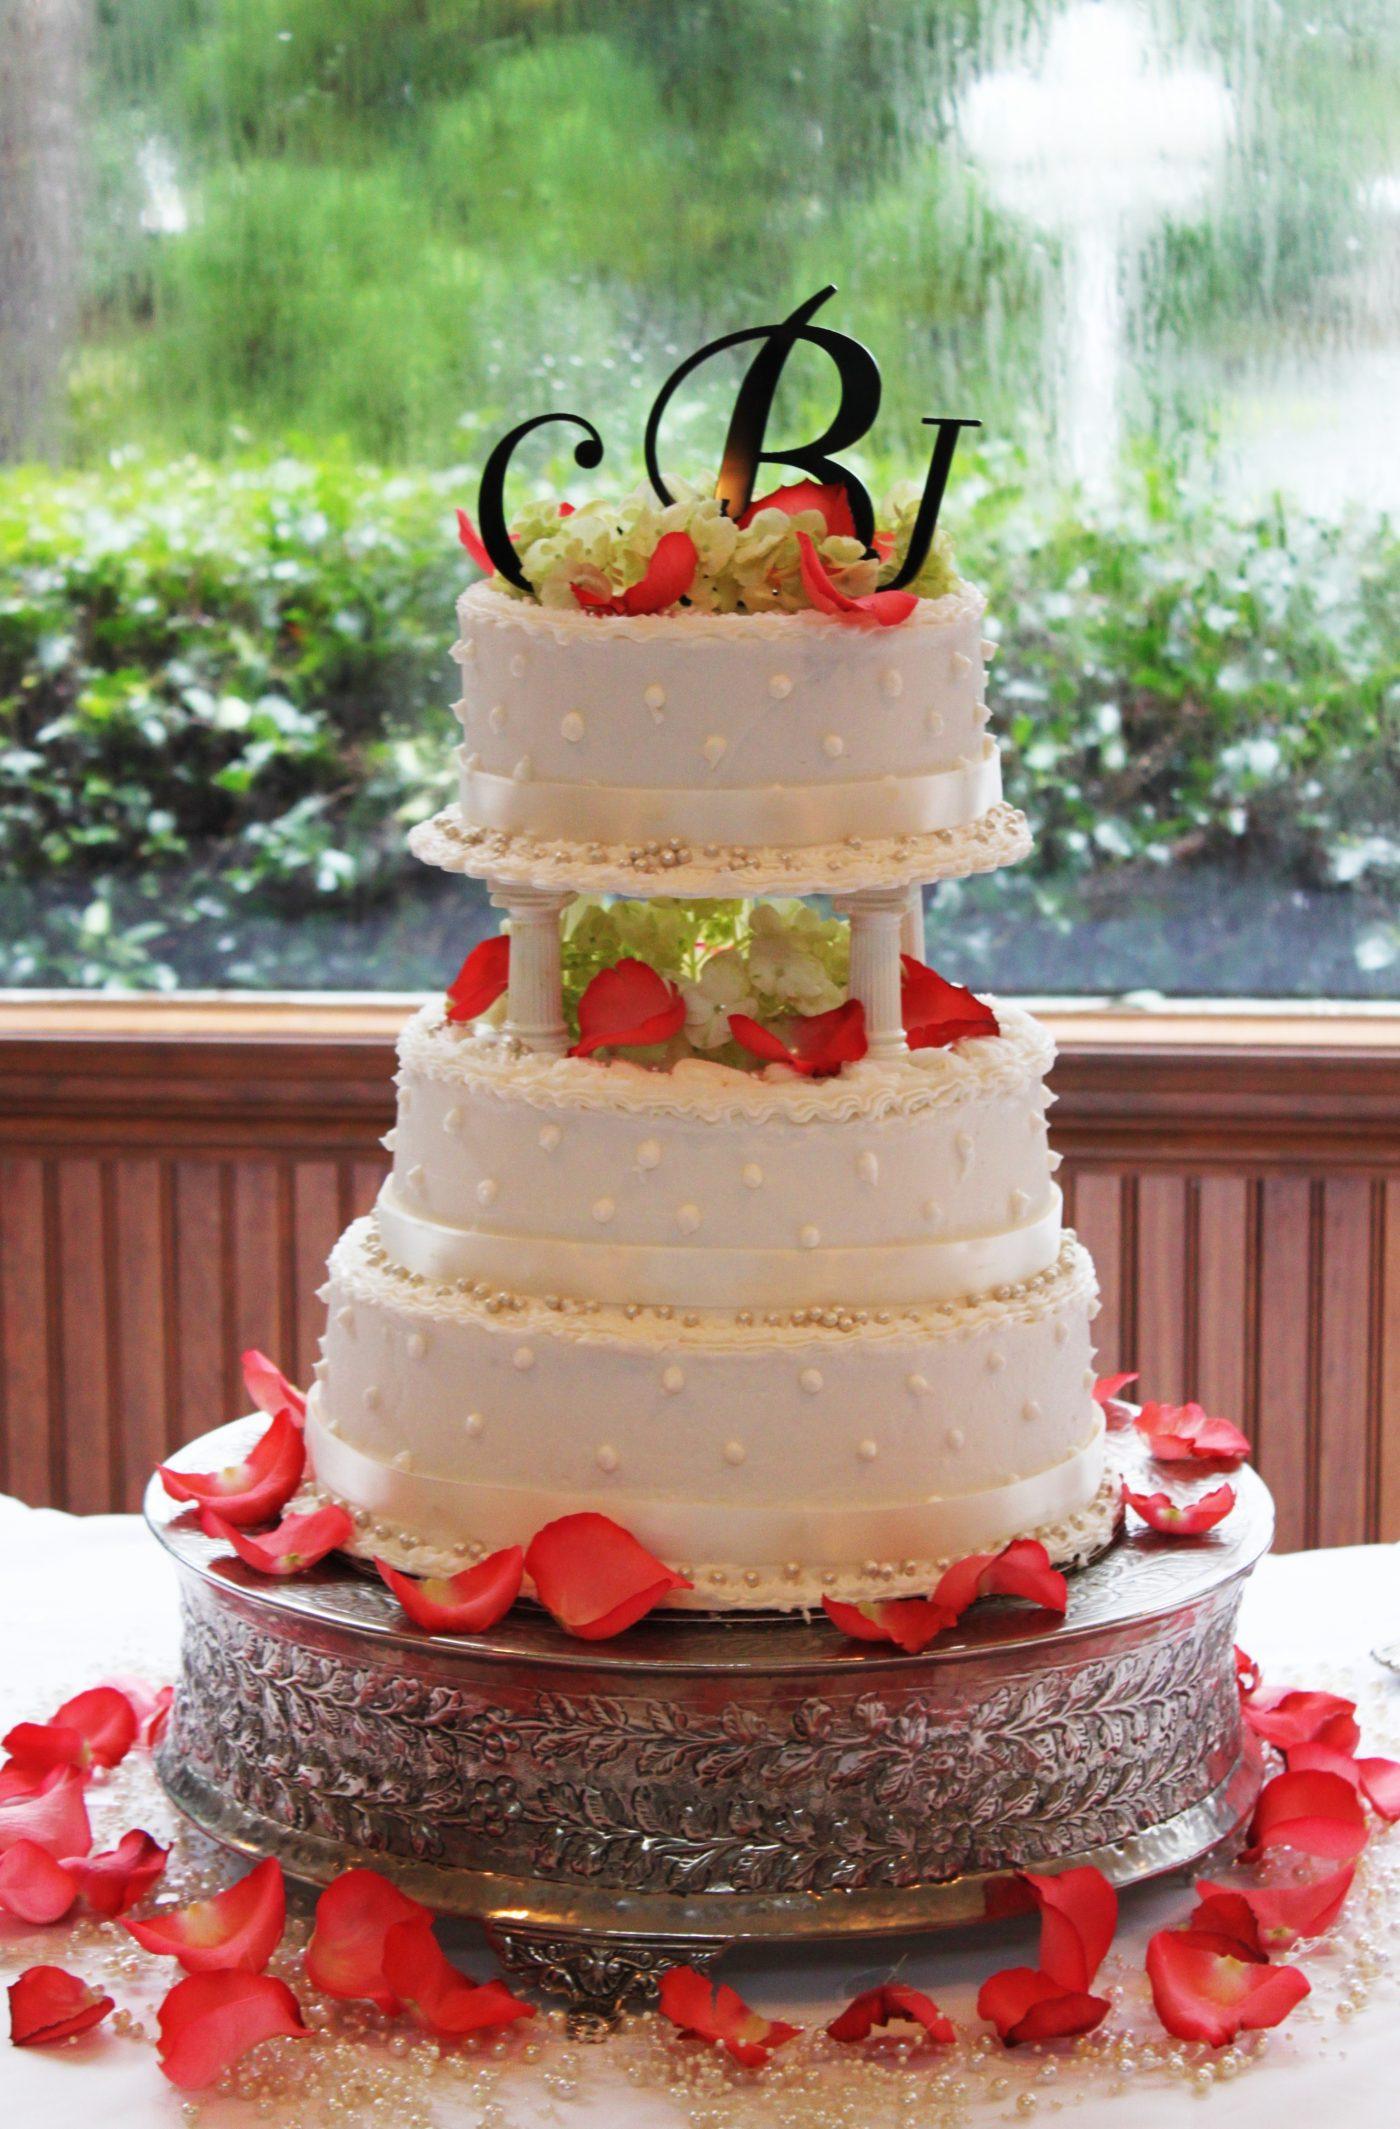 Wedding Cake Picture GSWC